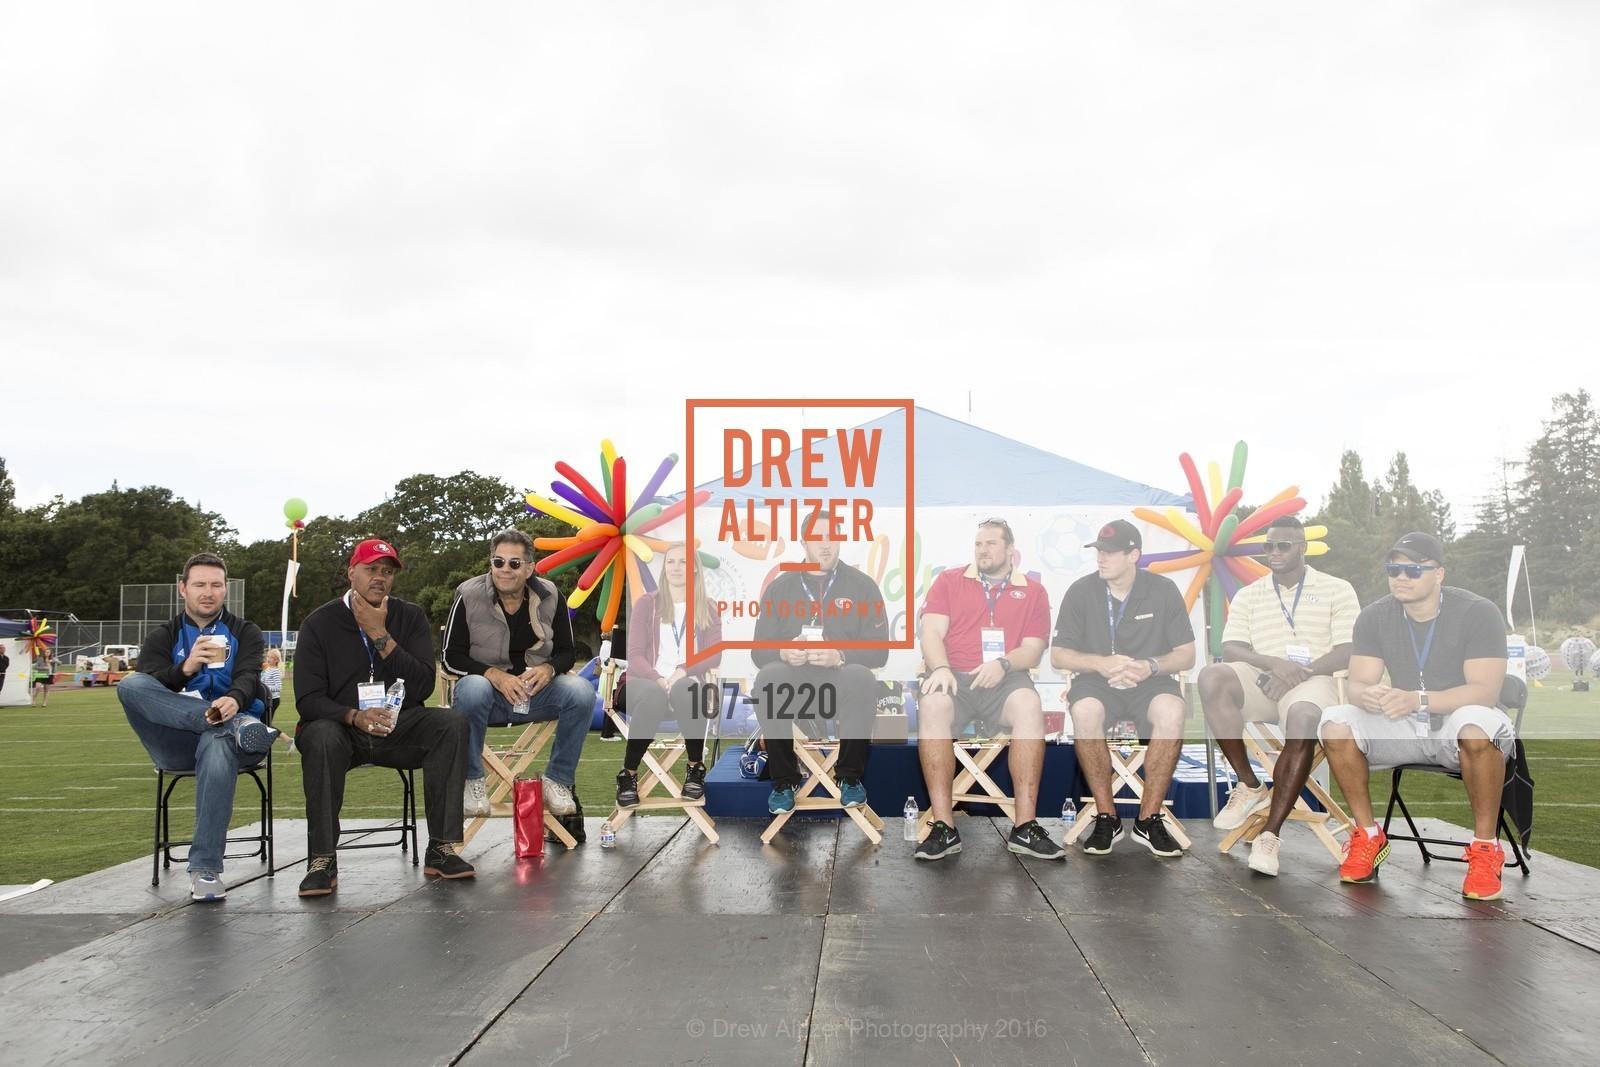 Joe Cannon, Dennis Brown, Carrie Drew, Joe Staley, Zane Beadles, Bradley Pinion, Latavius Murray, Brennan Scarlett, Photo #107-1220